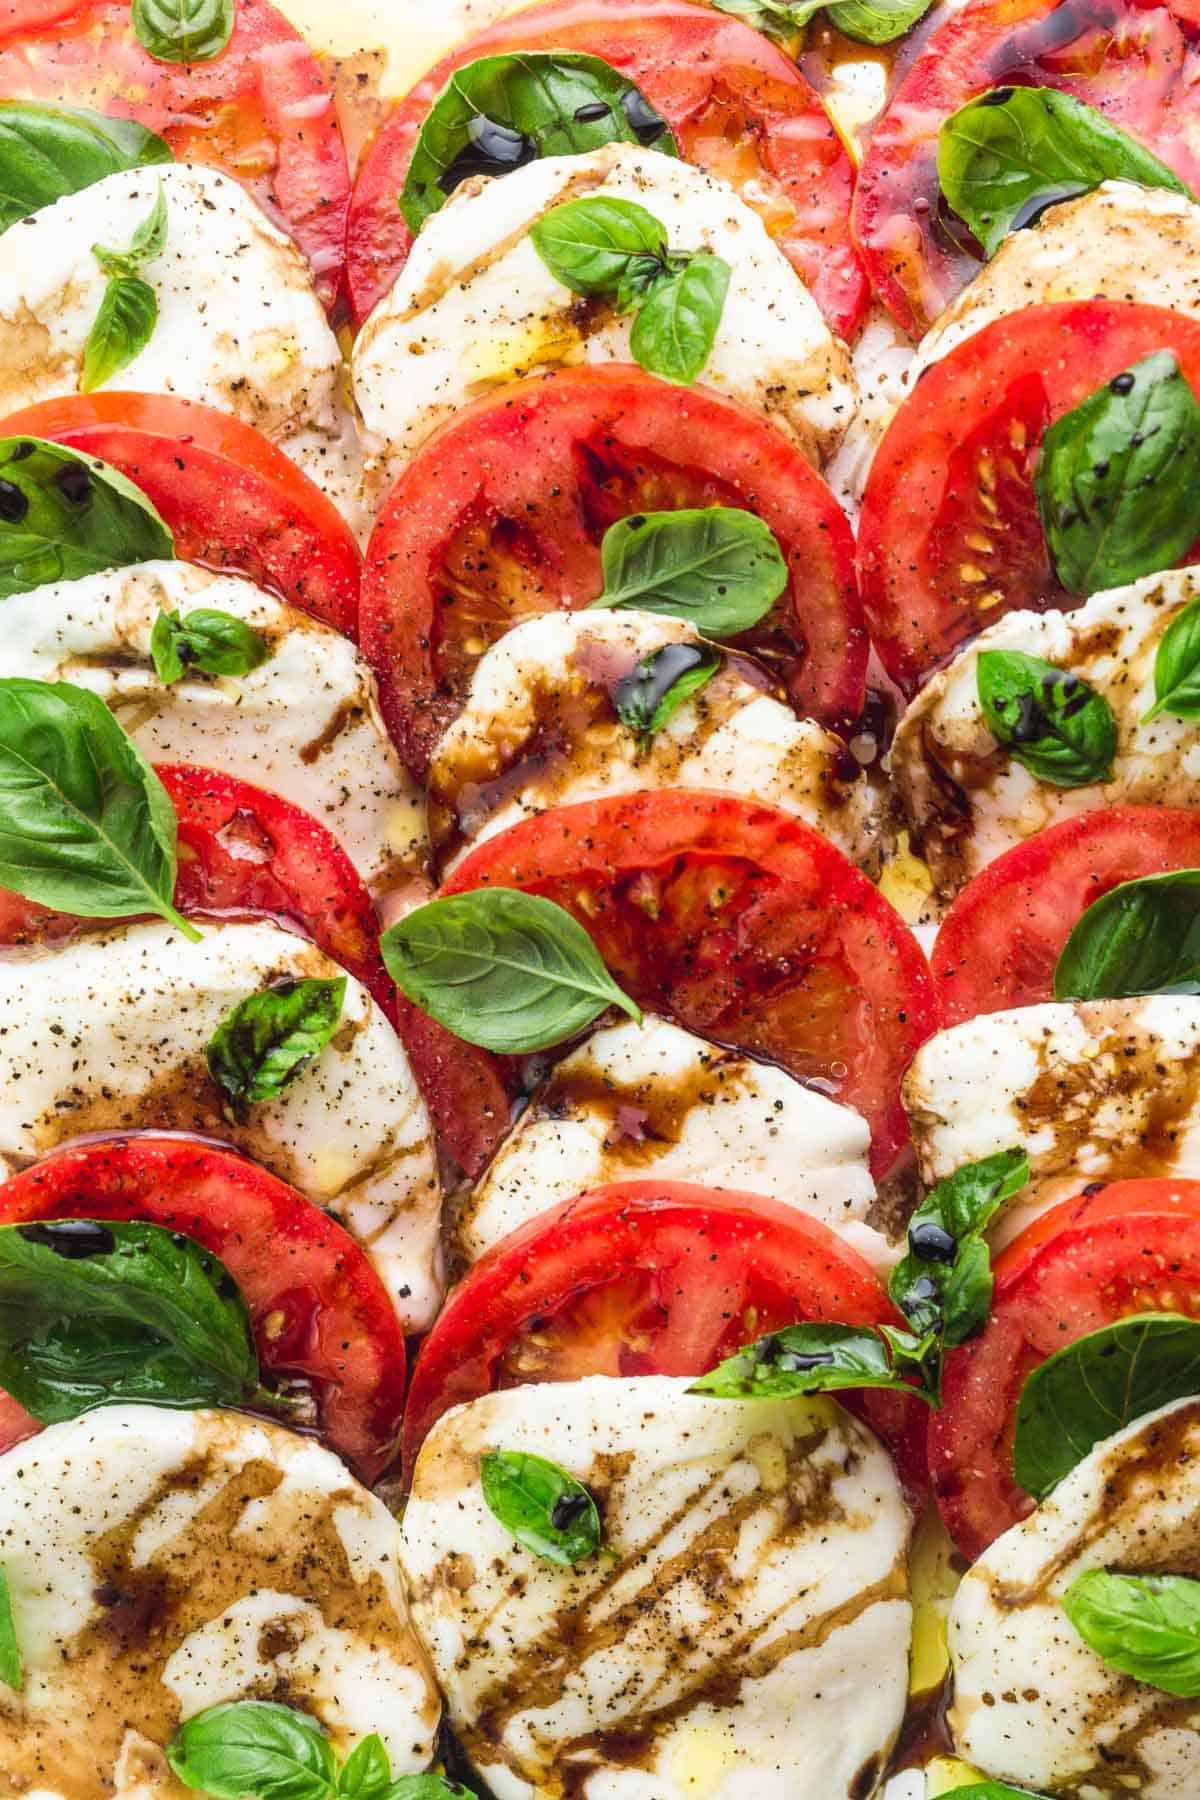 Caprese salad with balsamic glaze and basil leave